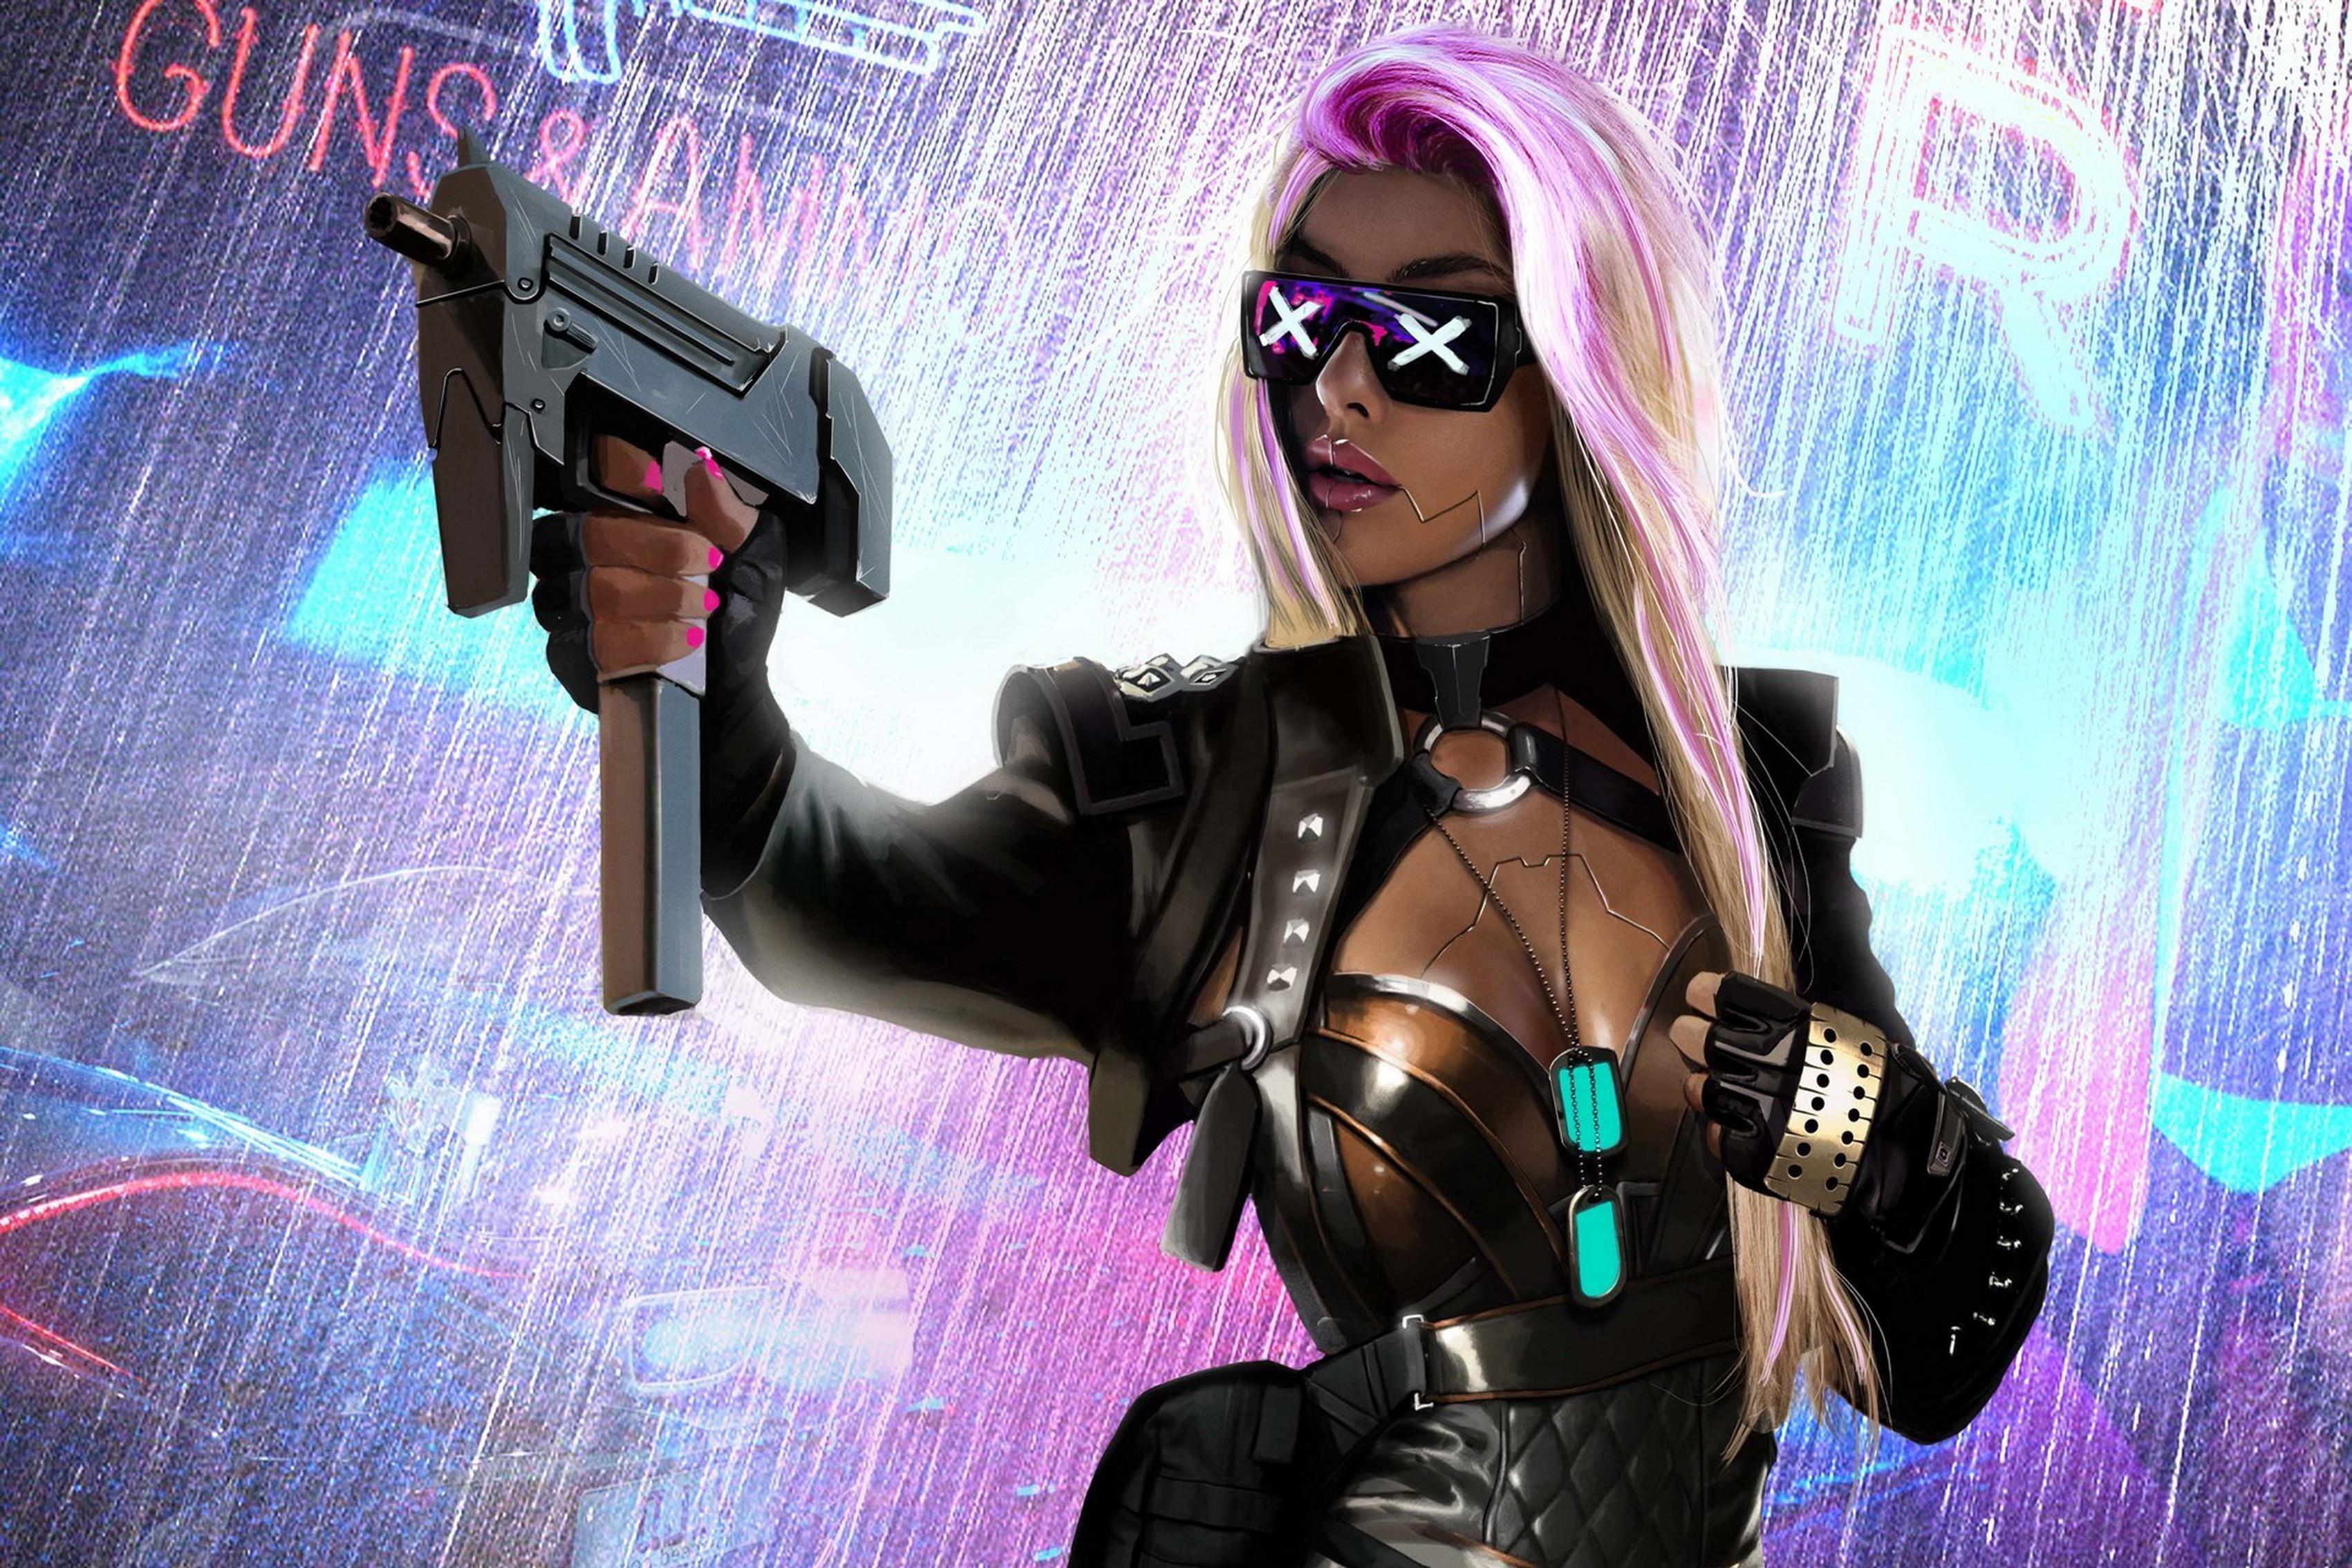 Home Decoration Fantasy Sci Fi Cyberpunk Girl Blonde